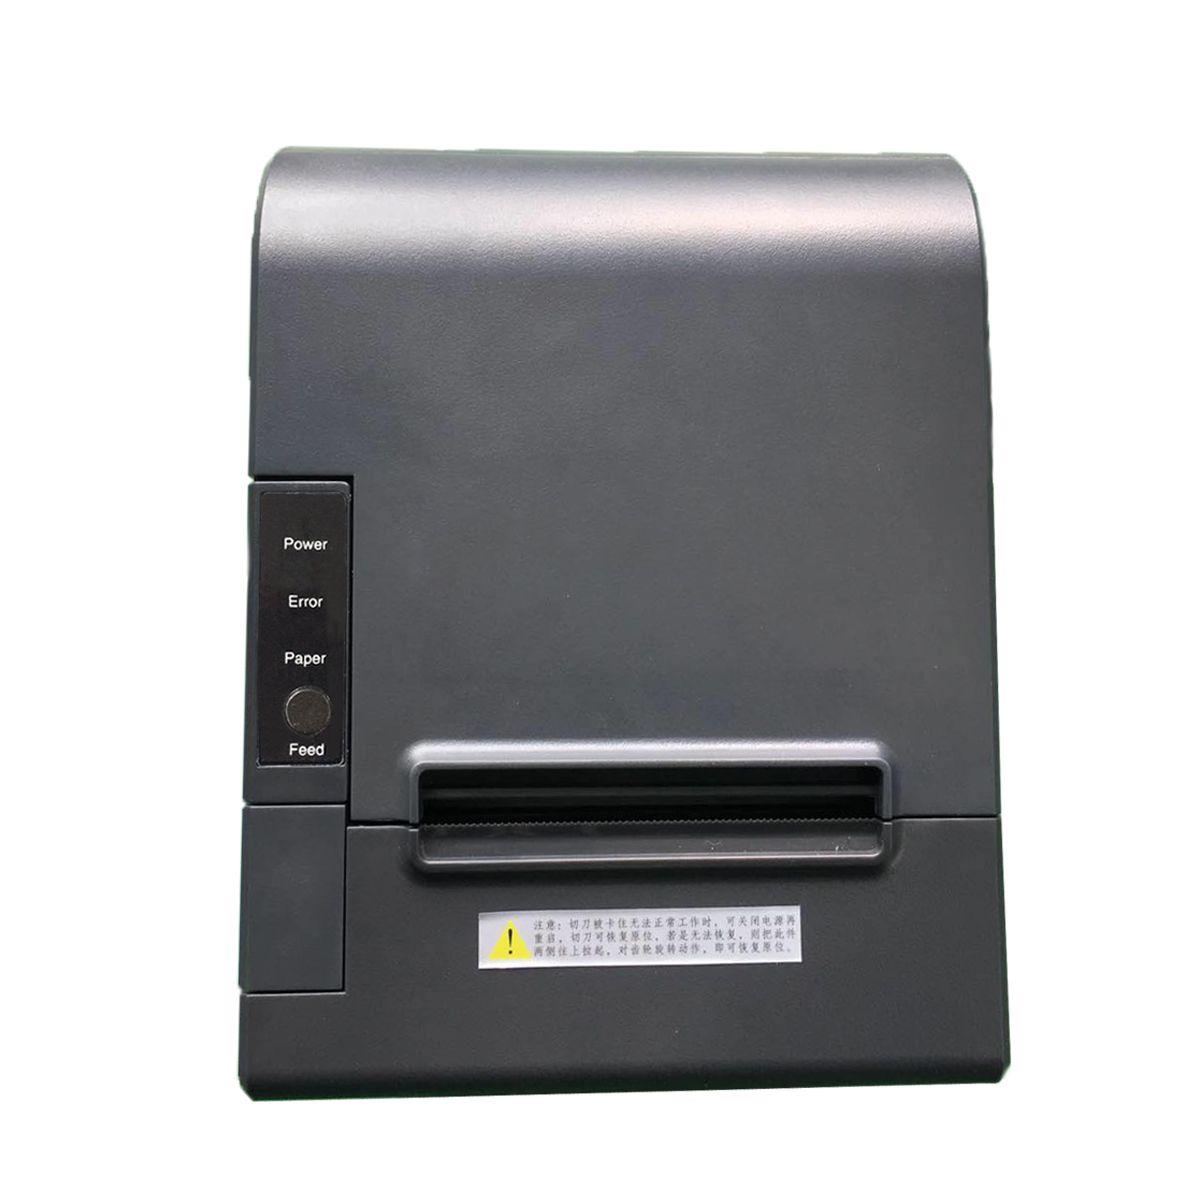 Hspos 3 بوصة سطح المكتب استلام الطابعة الحرارية دعم الخط الناقل التسلسلي العام إيثرنت المسلسل للسينما تذكرة آلة الطباعة HS-802USL